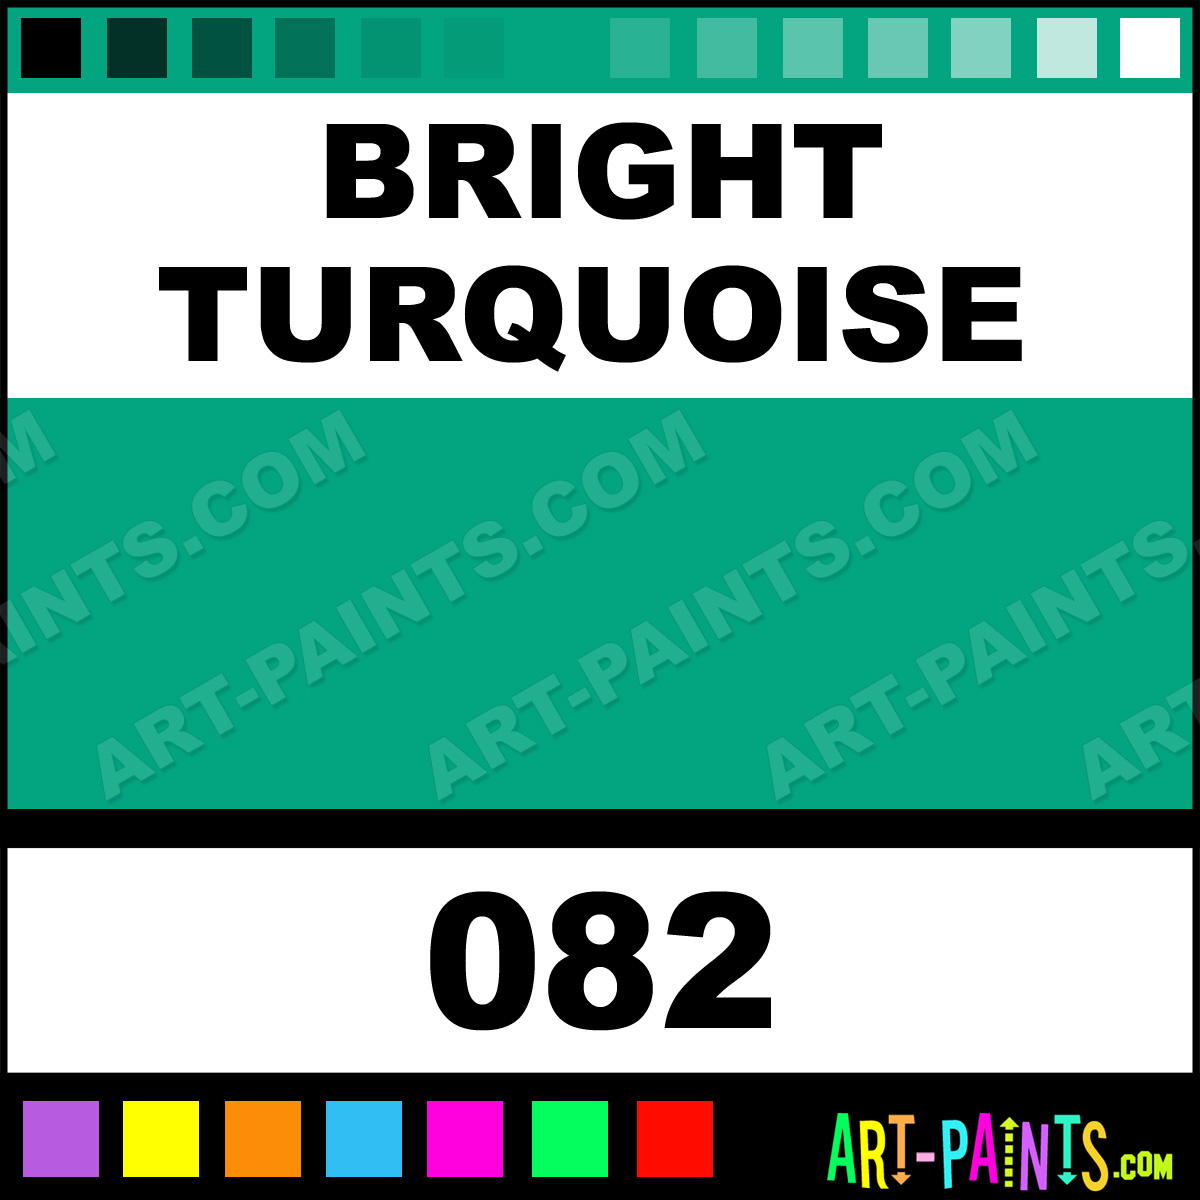 Bright turquoise oil pastel paints 082 bright - Bright turquoise paint colors ...